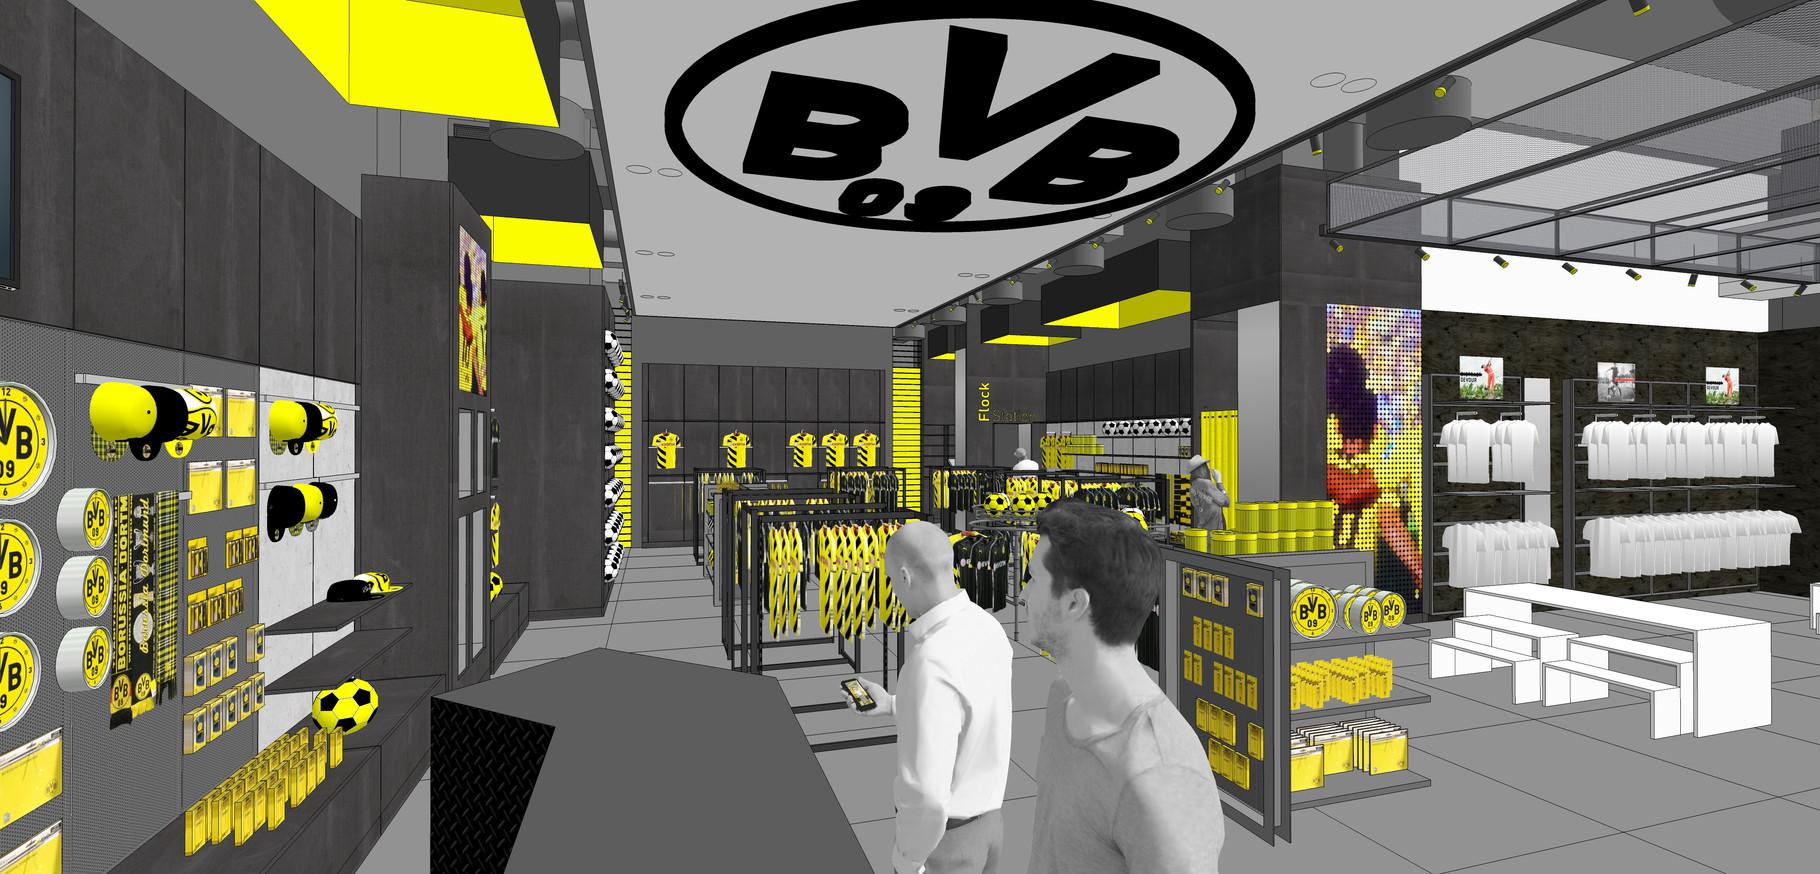 BVB Fanshop | CentrO Oberhausen